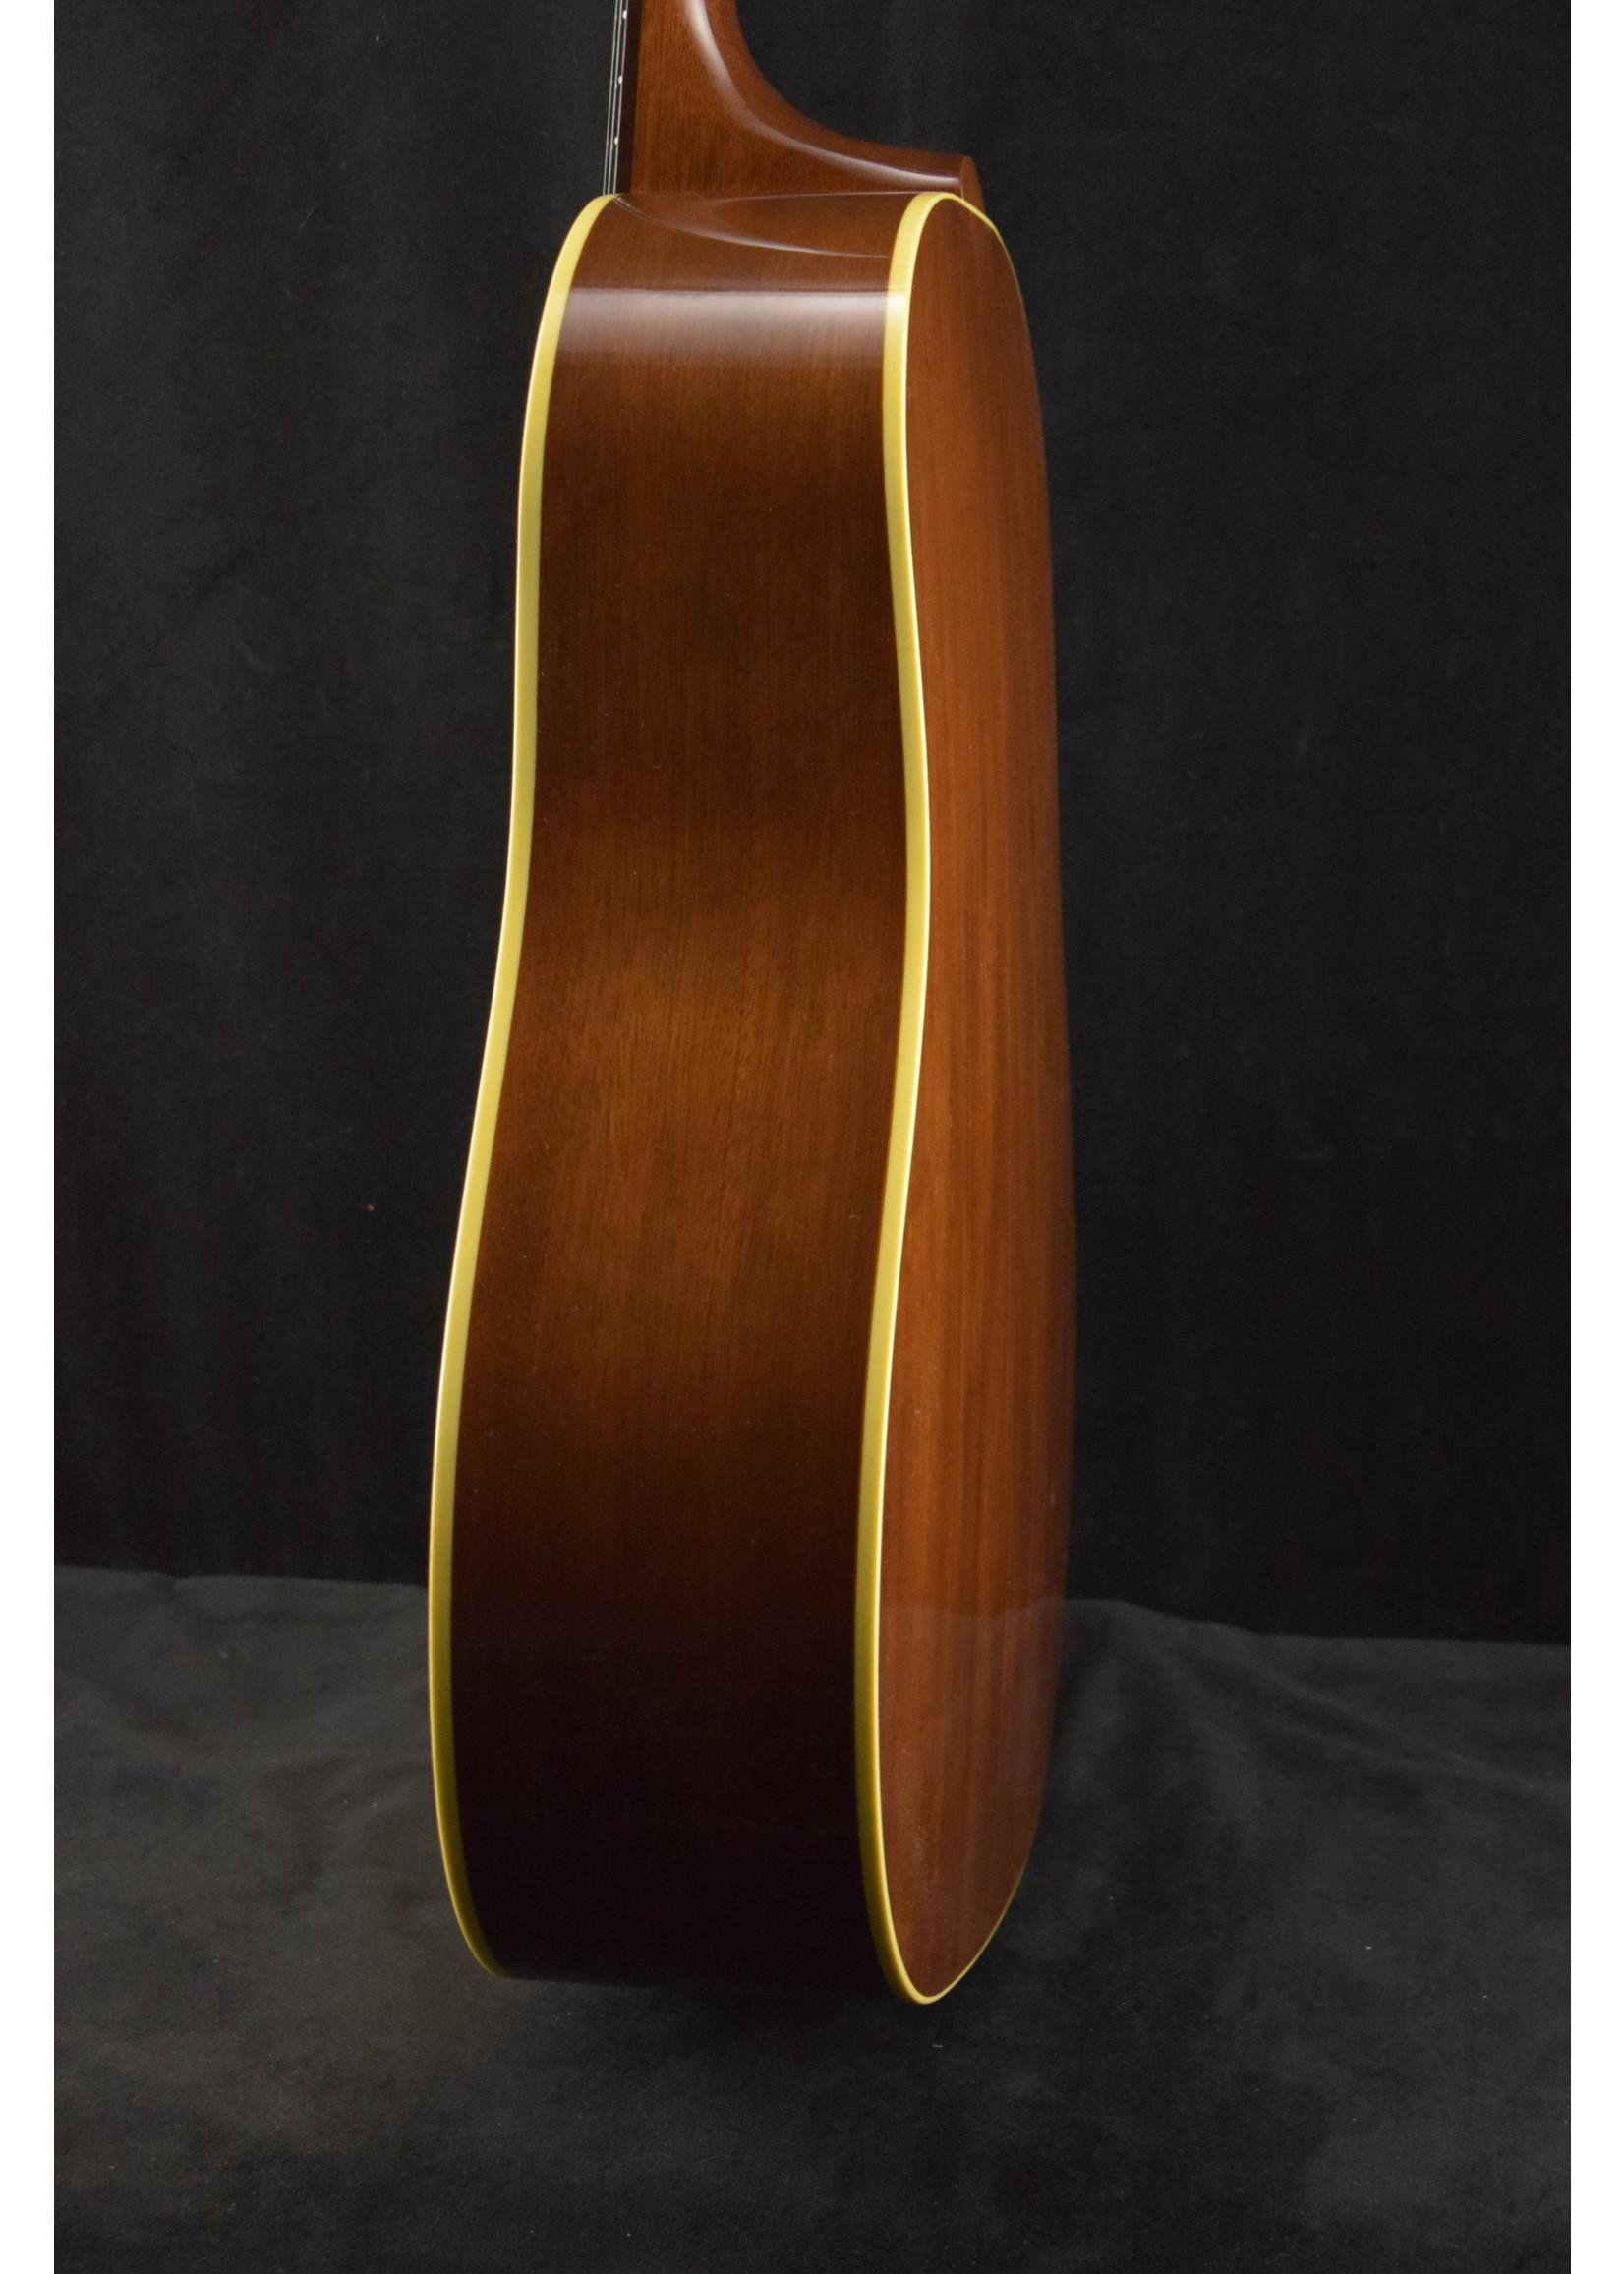 Gibson Gibson 60's J-50 Original, Adjustable Saddle (No Pickup) Antique Natural